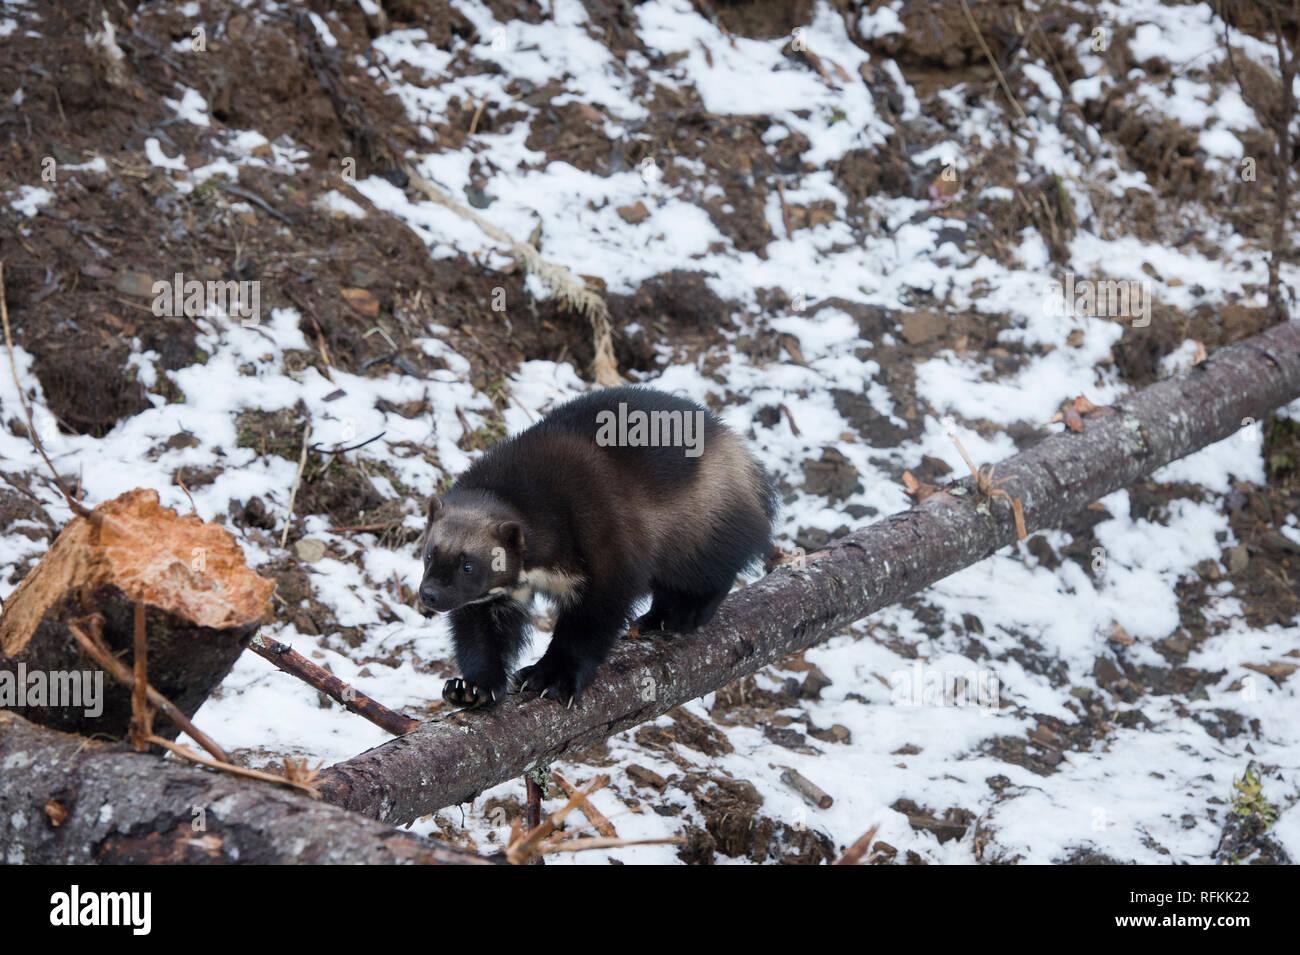 Captive wolverine walking on a log near Haines Alaska - Stock Image